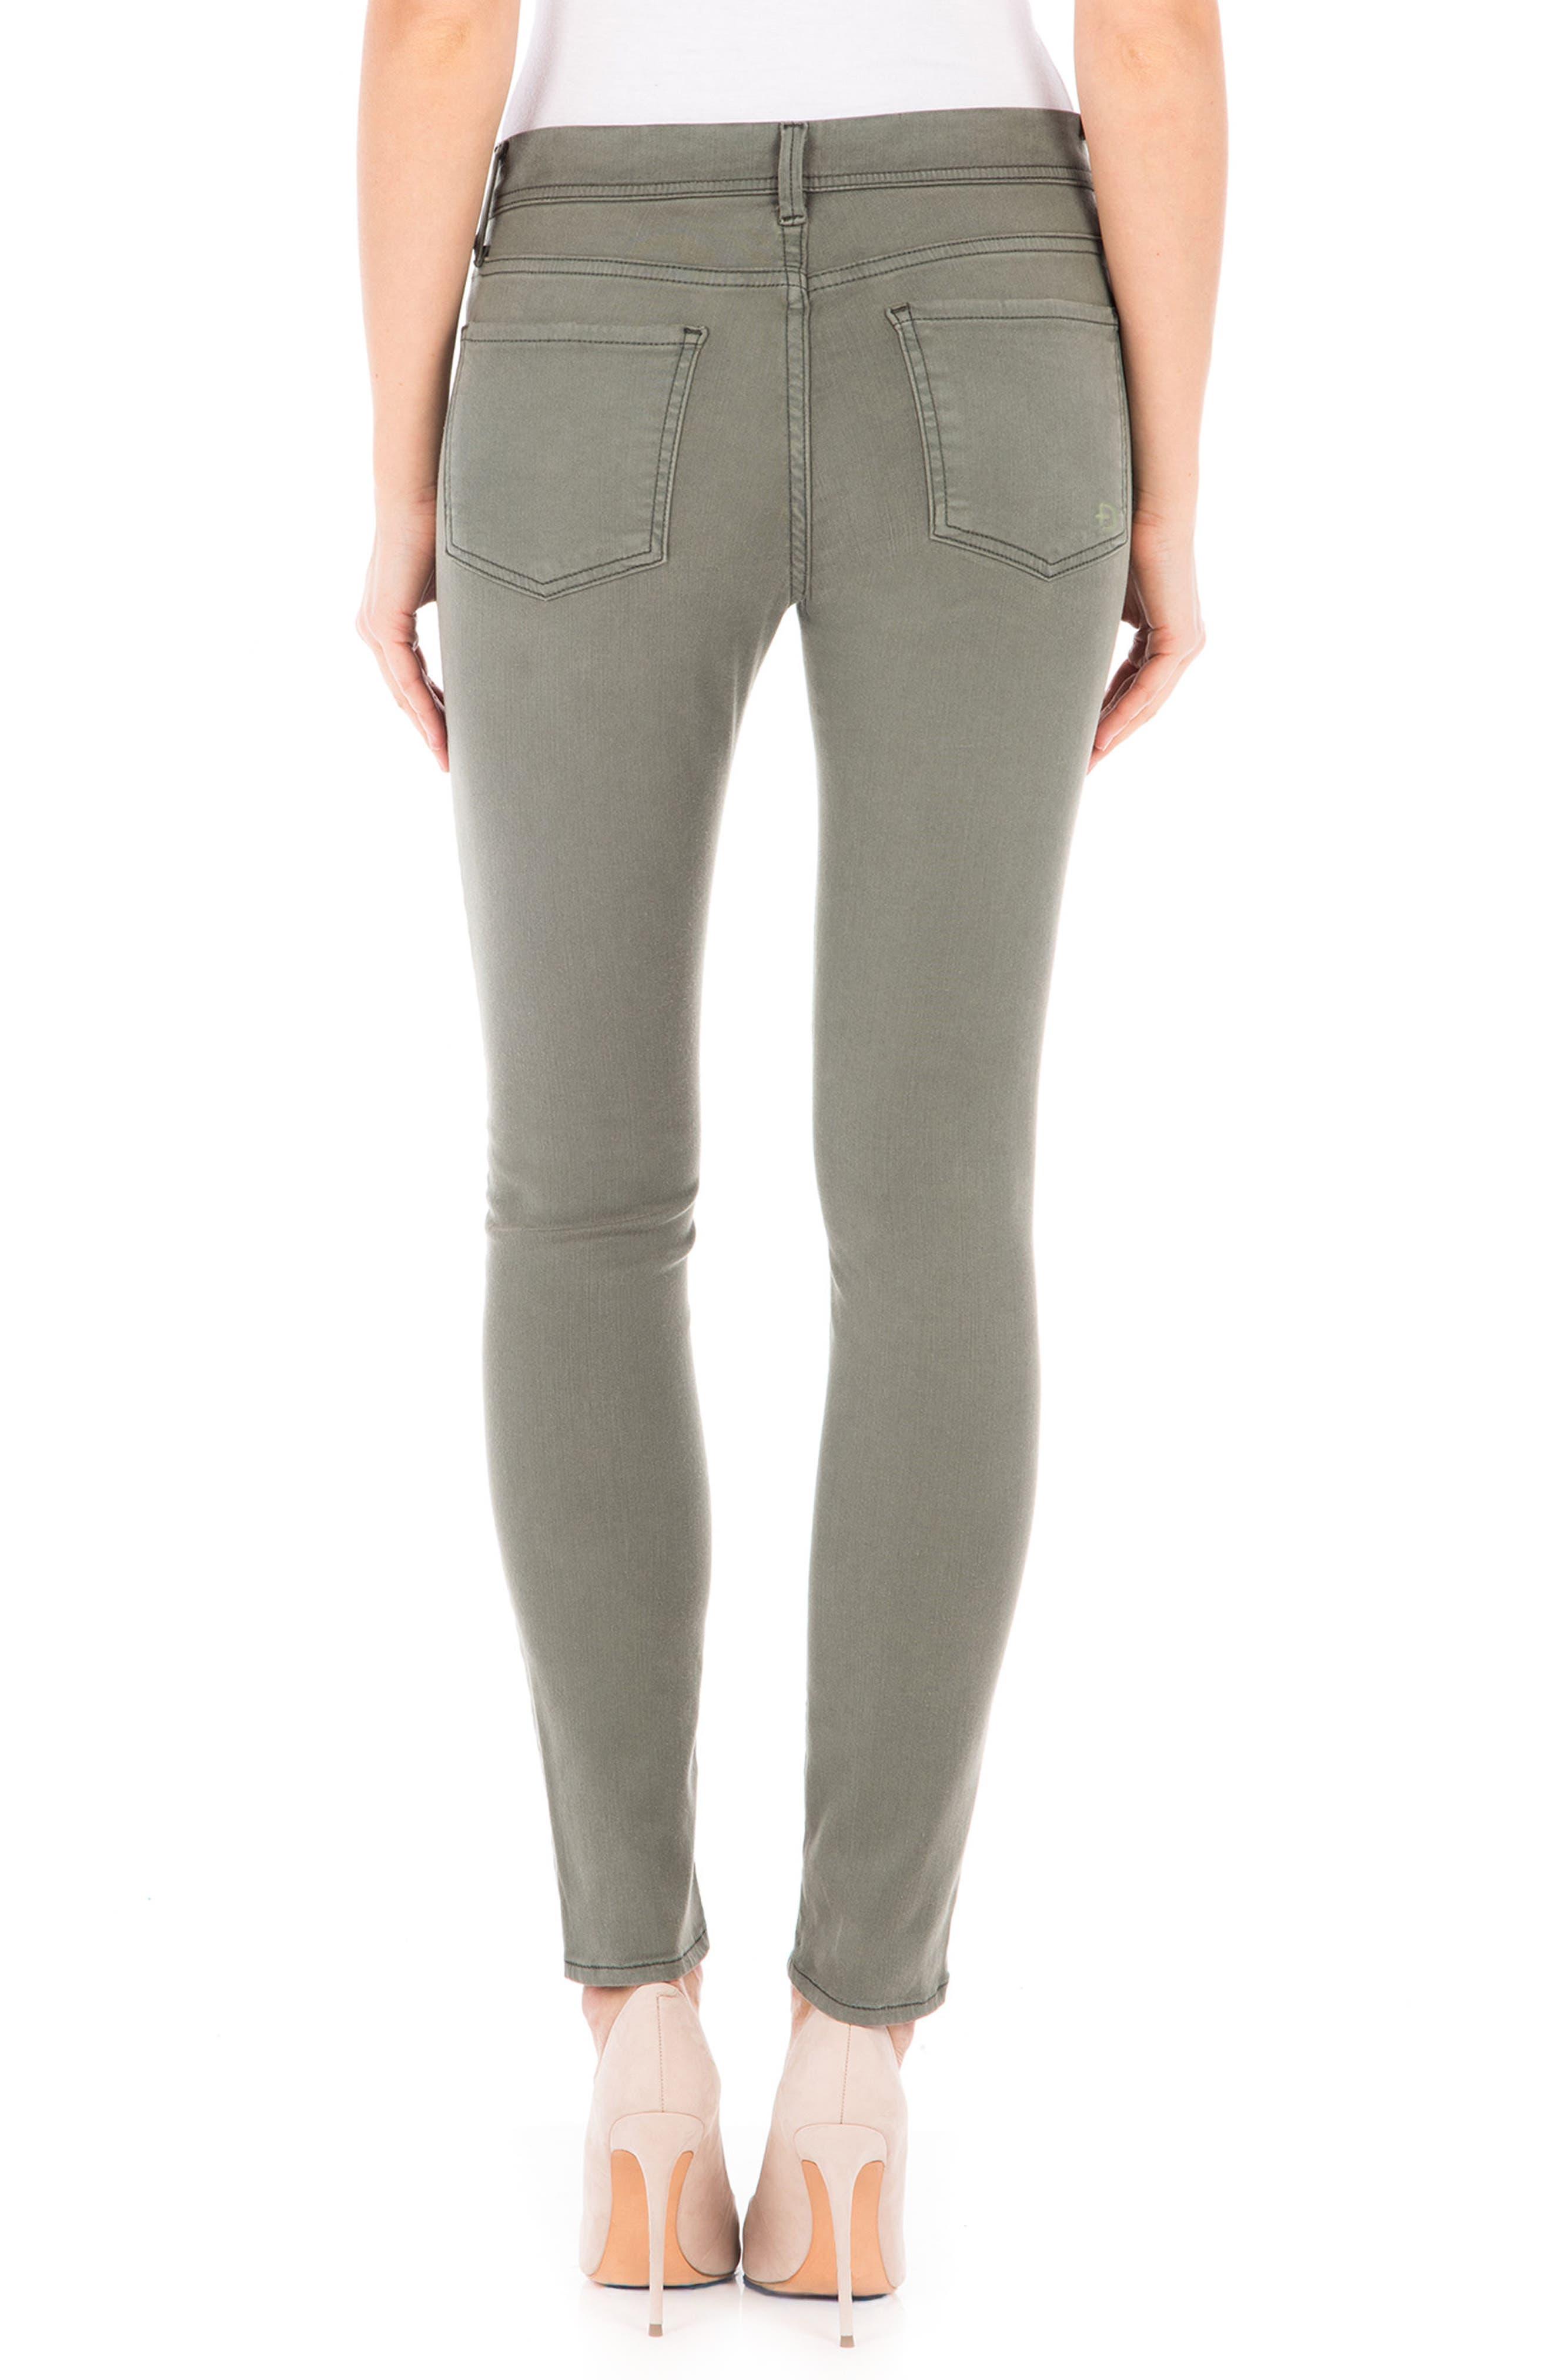 Sola Skinny Jeans,                             Alternate thumbnail 2, color,                             Pistachio